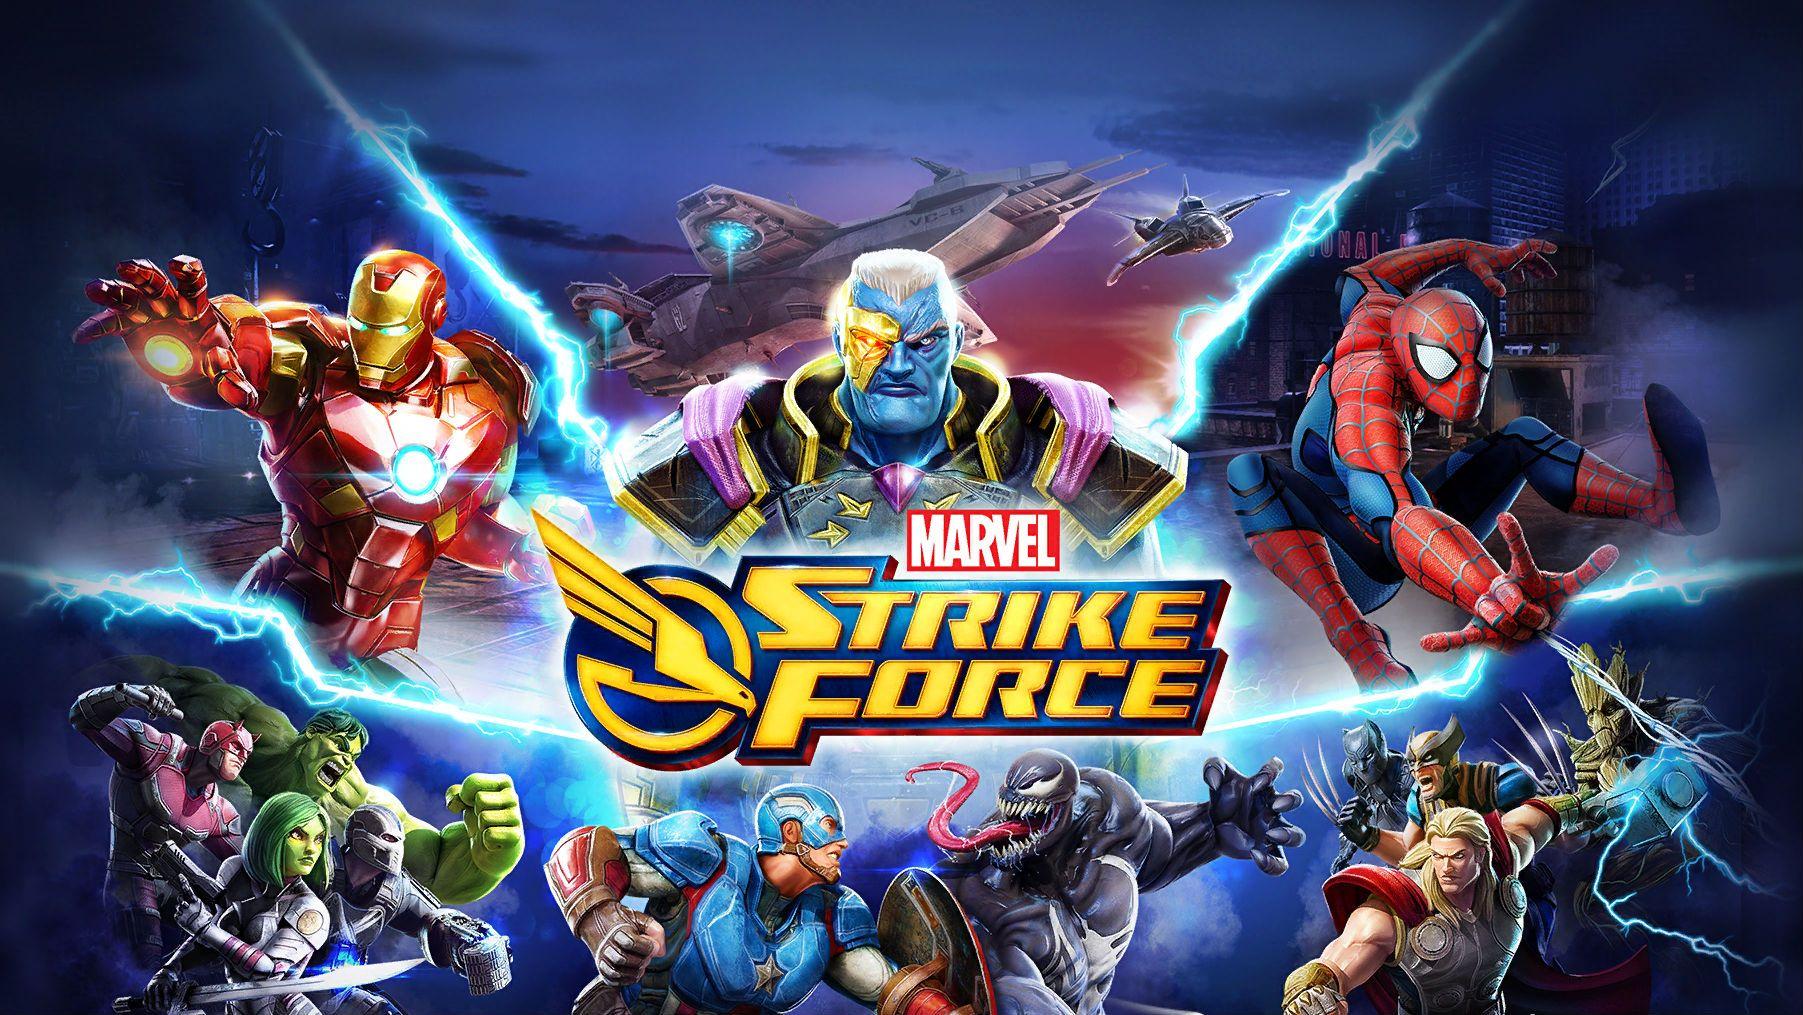 Marvel Strike Force Mod Apk Unlimited Energy Free Download For Android Marvel Strike Force Android Mod Infinite Energy Marvel Game App Android